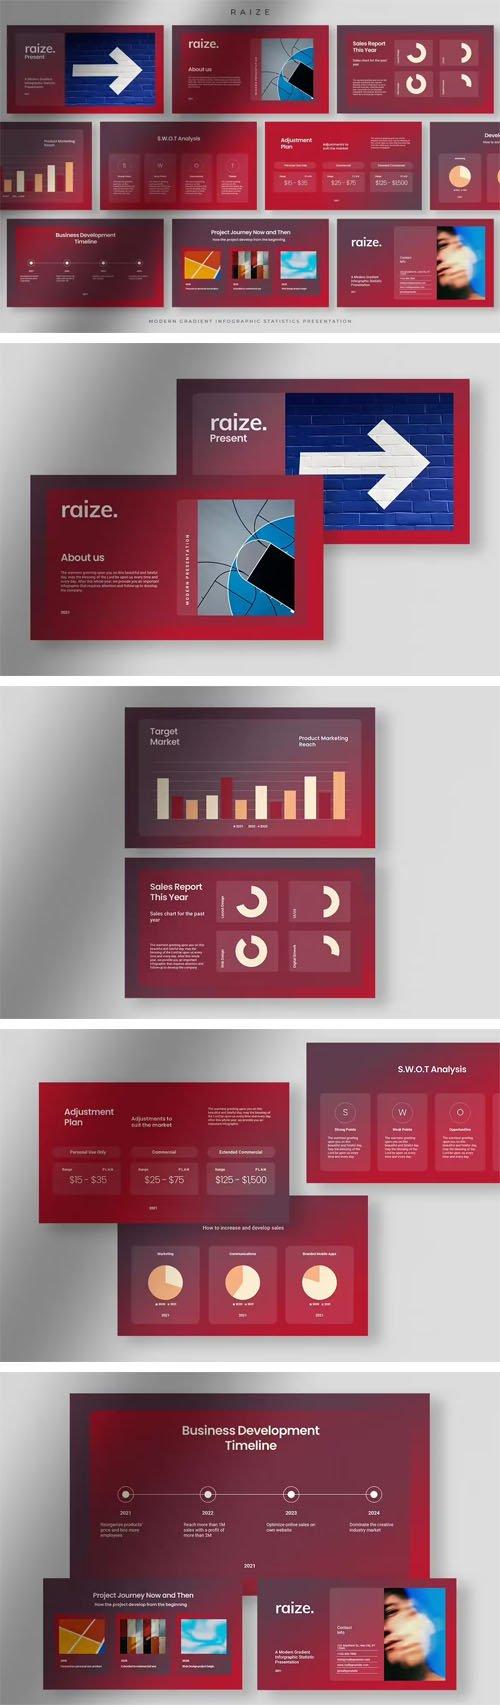 Raize - Infographic Statistics Powerpoint Presentation Template